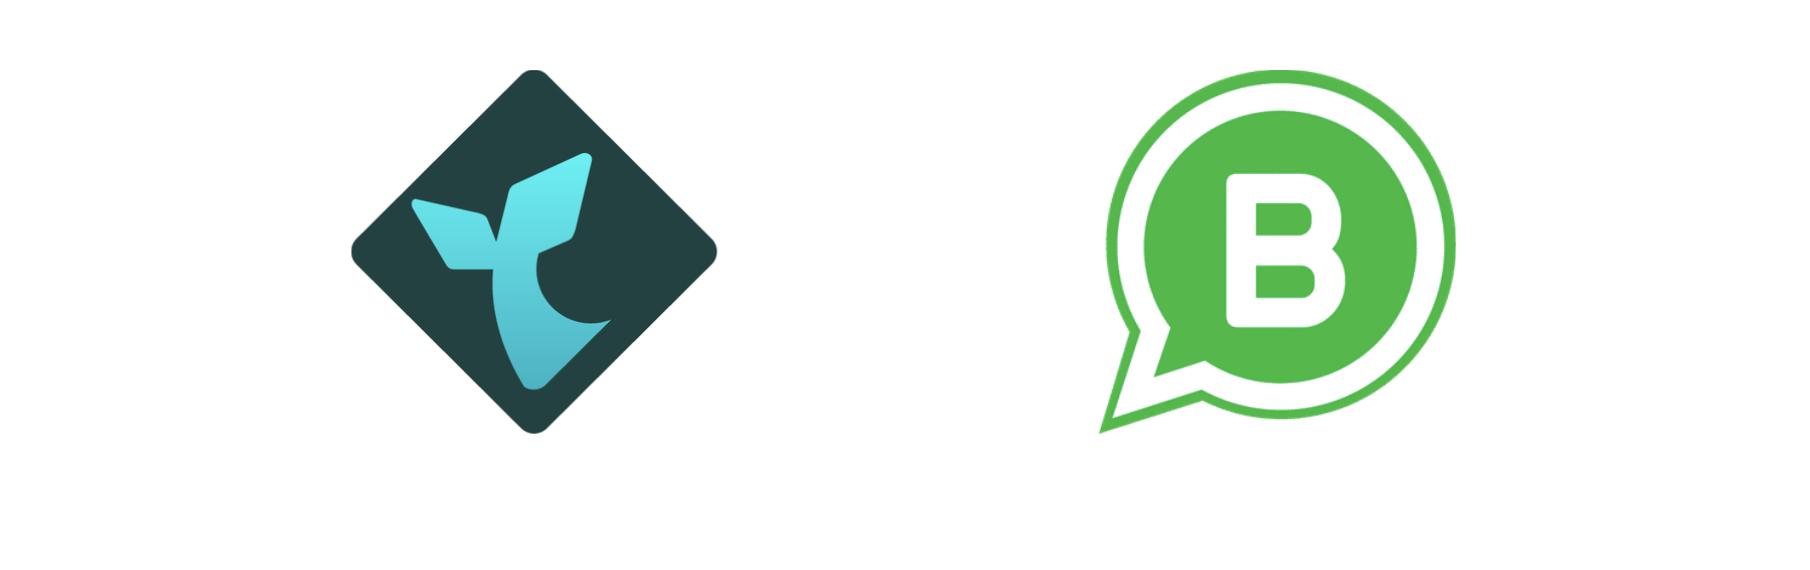 logo sirena logo whatsapp